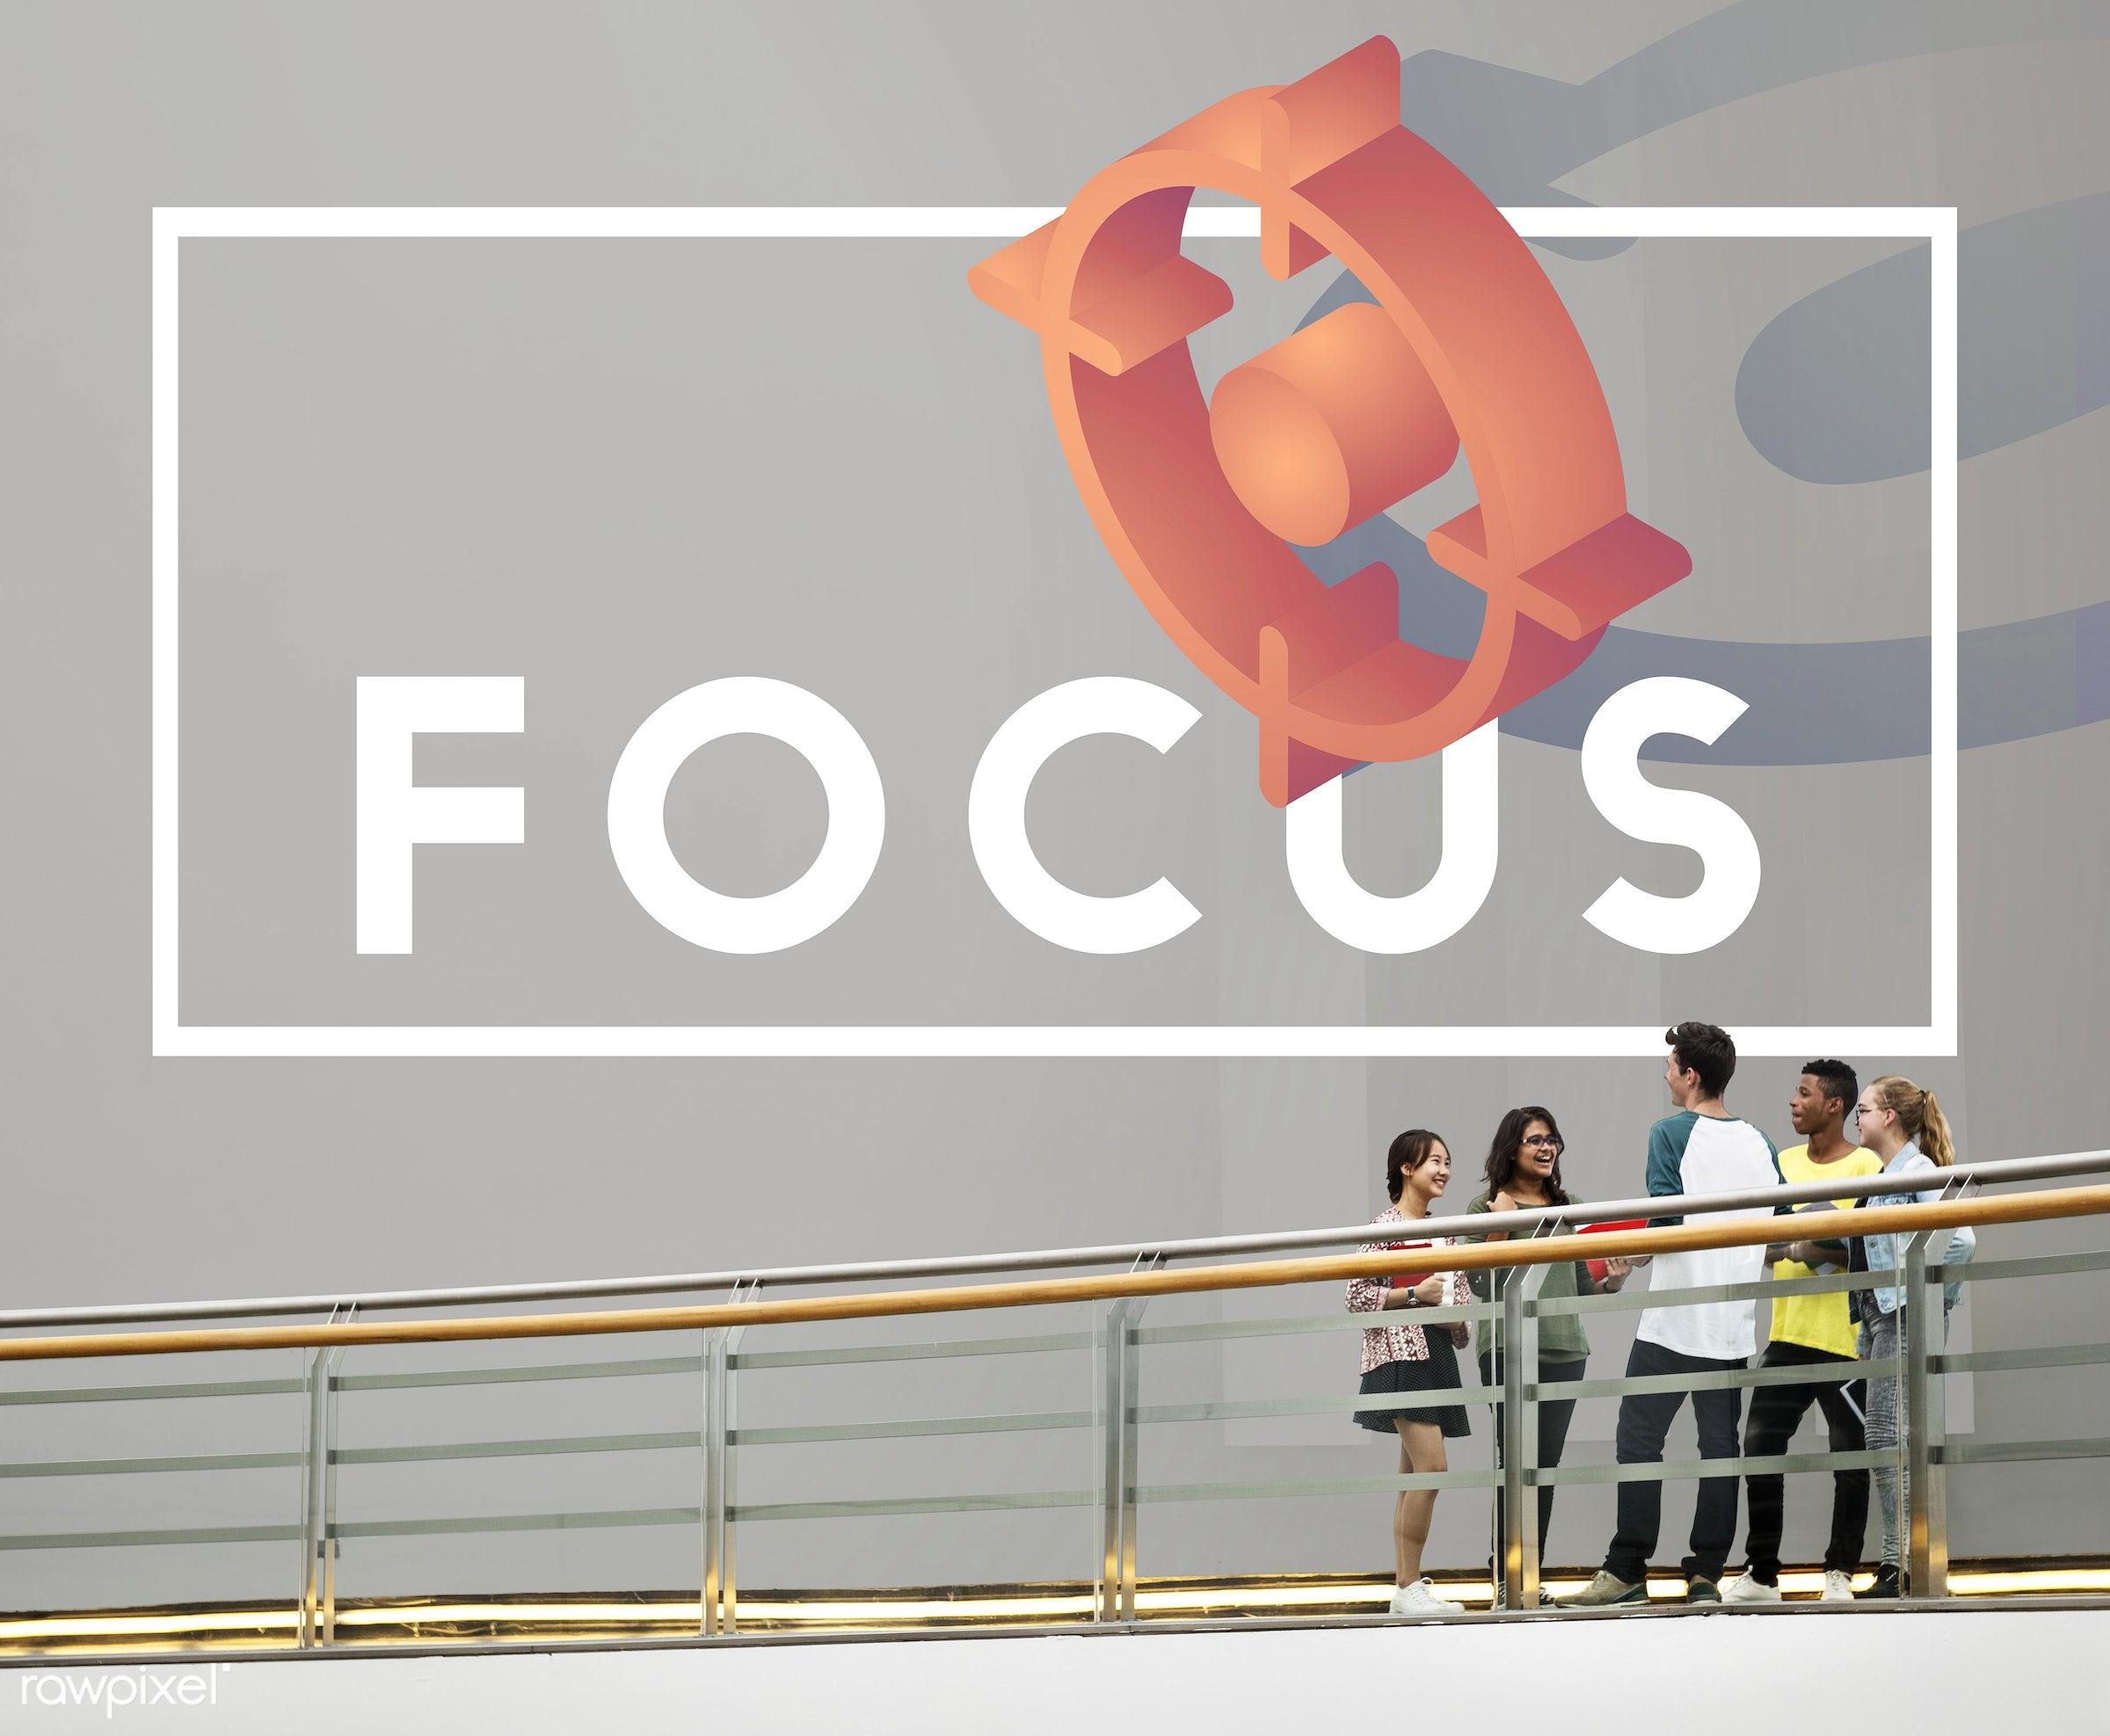 development, aim, book, books, boy, bridge, business, business plan, carrying, corporate, corporation, direction, focus,...